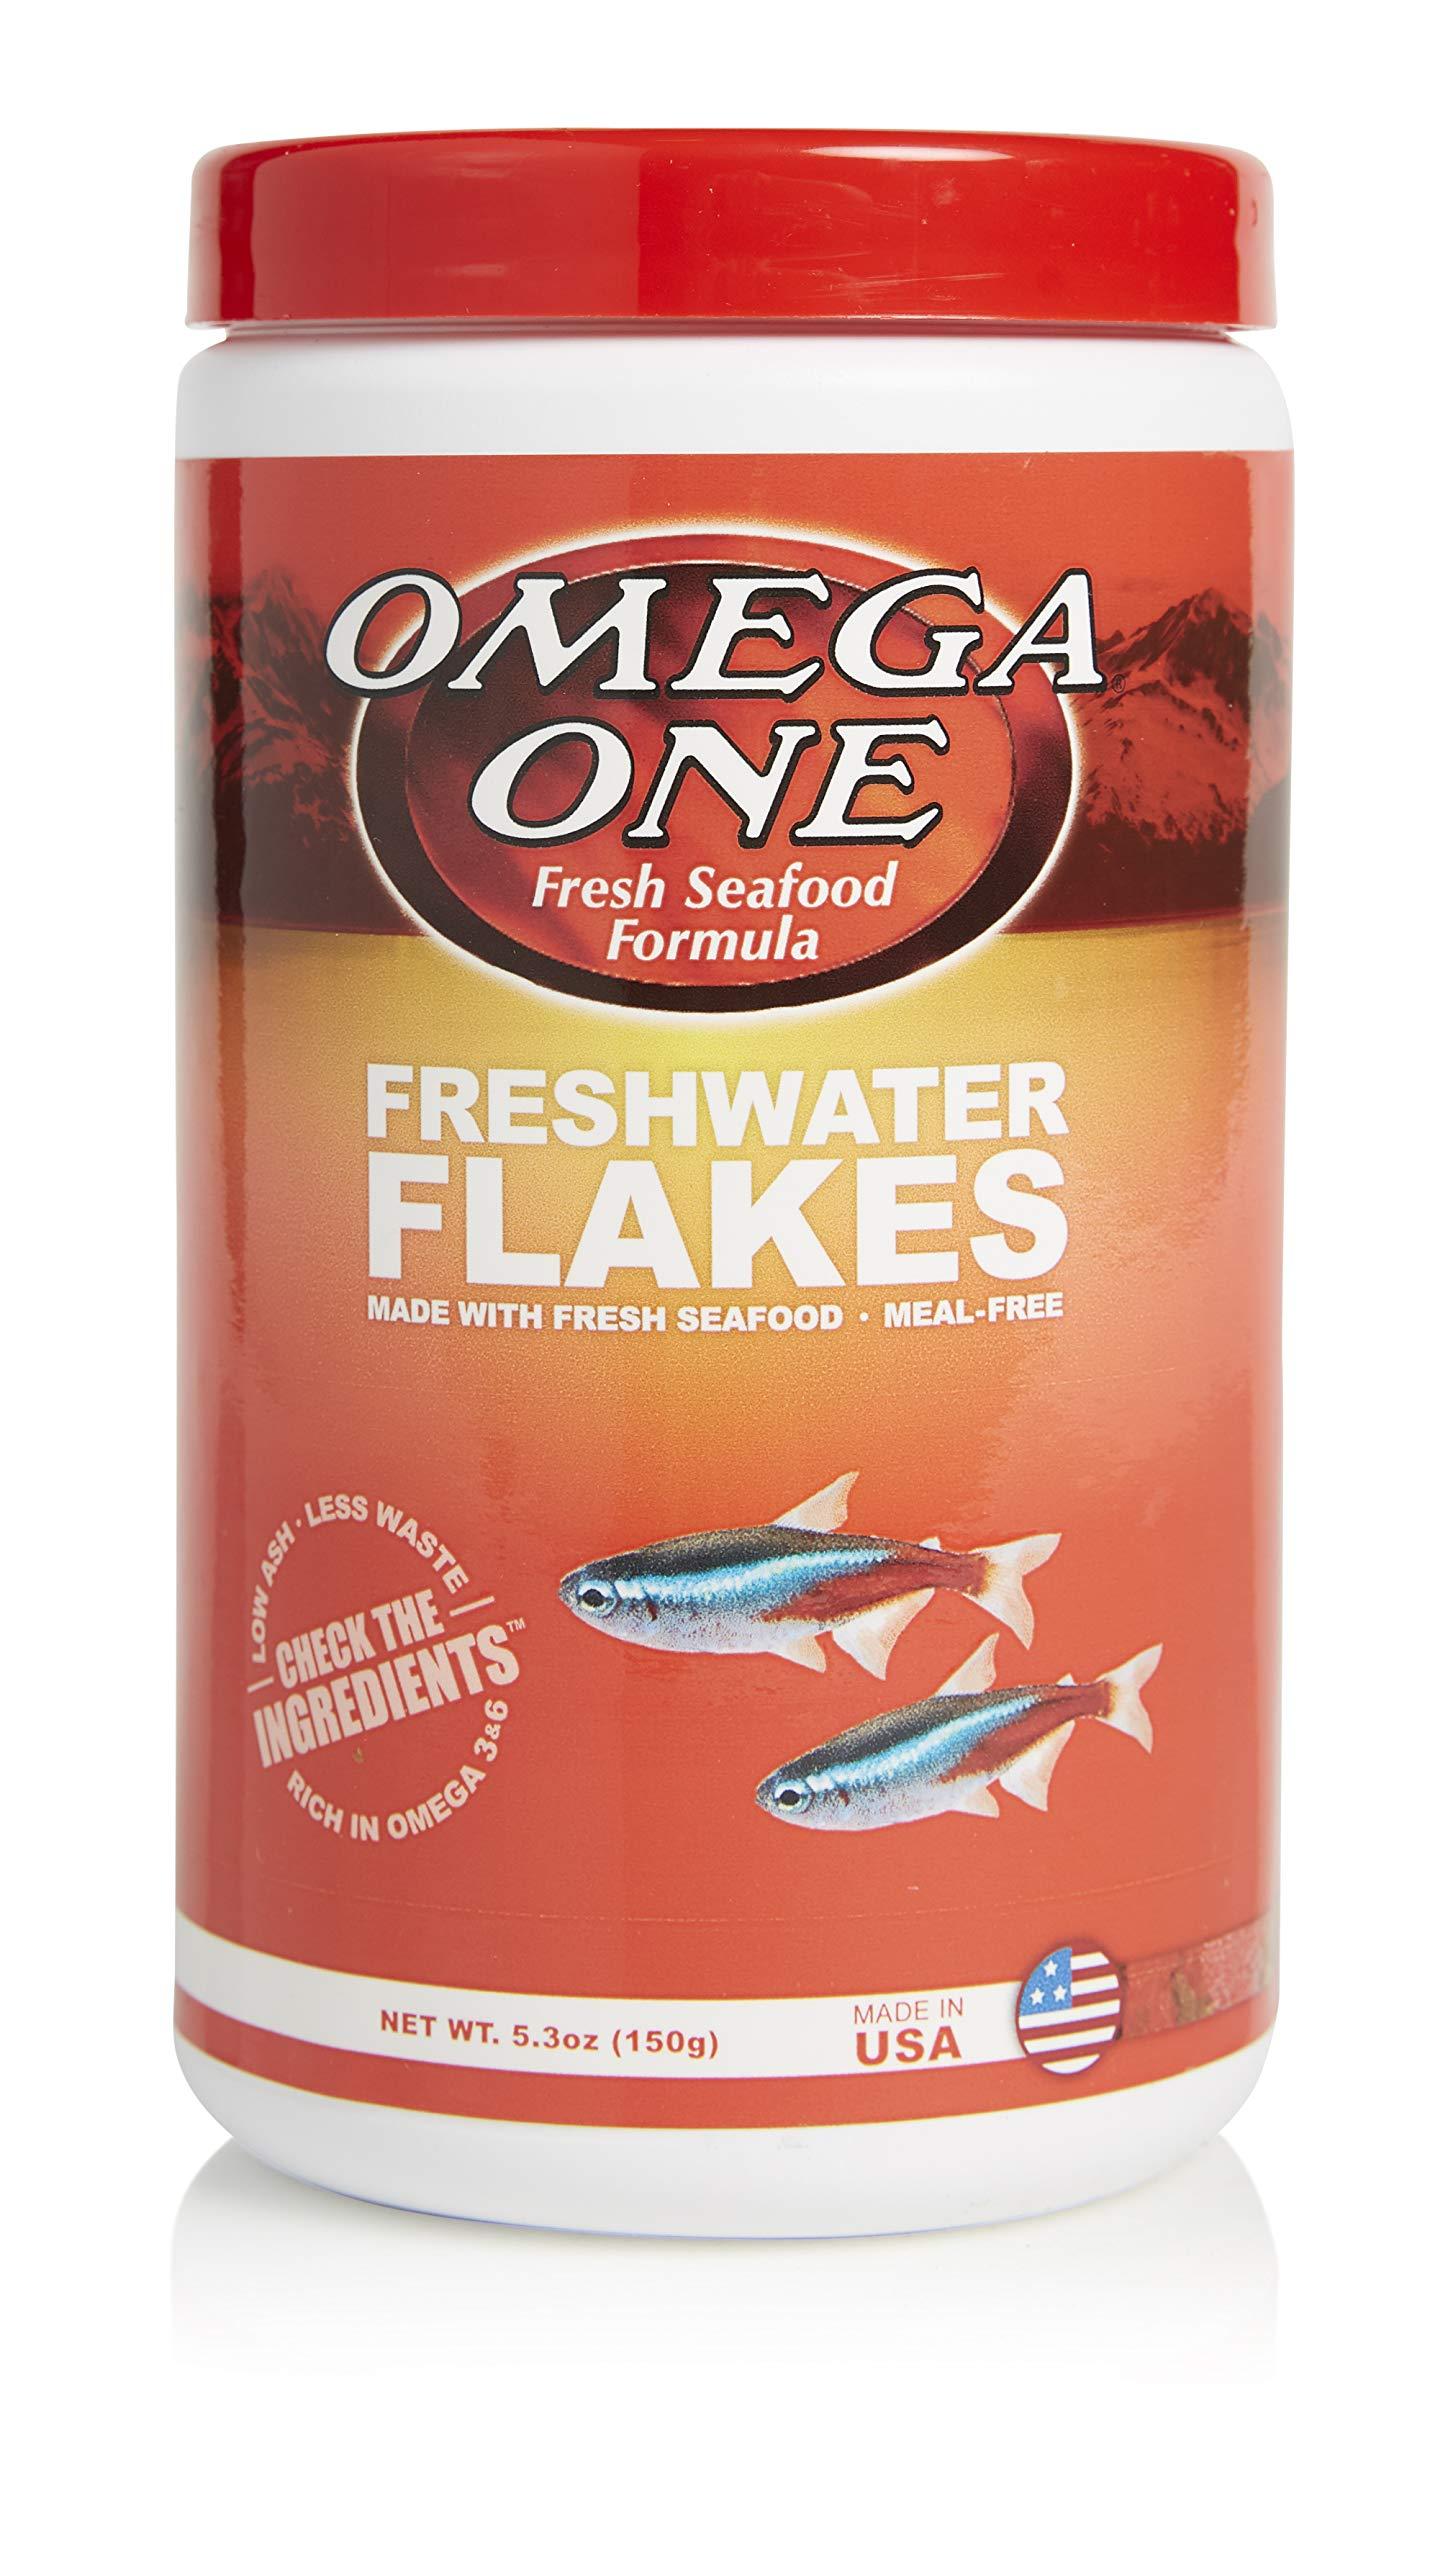 Omega One Freshwater Flakes, 5.3 oz by Omega One